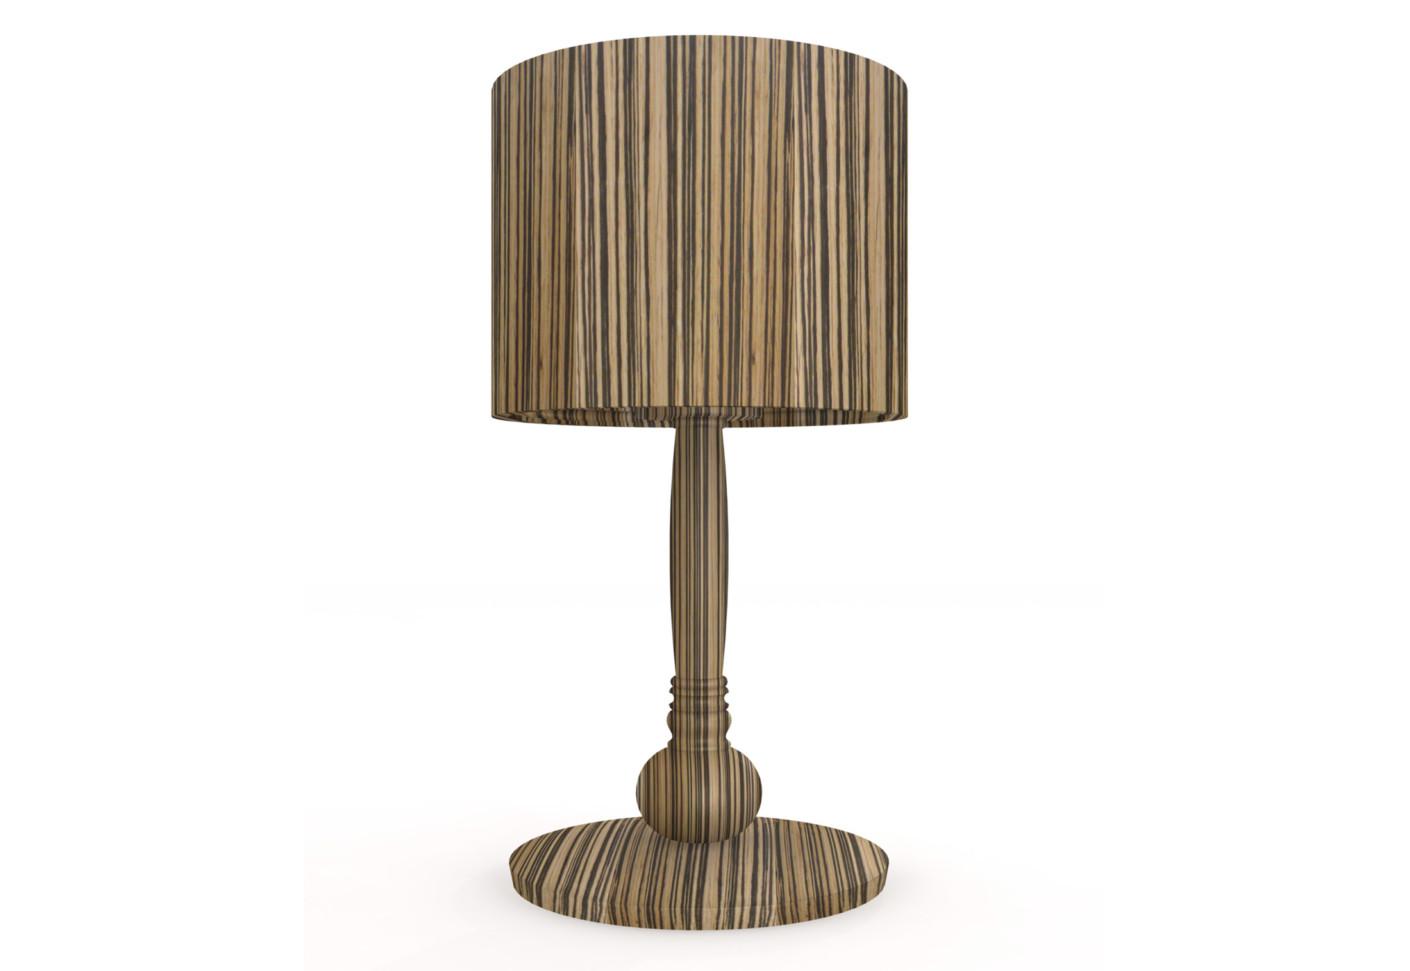 Tree table lamp by Moooi | STYLEPARK